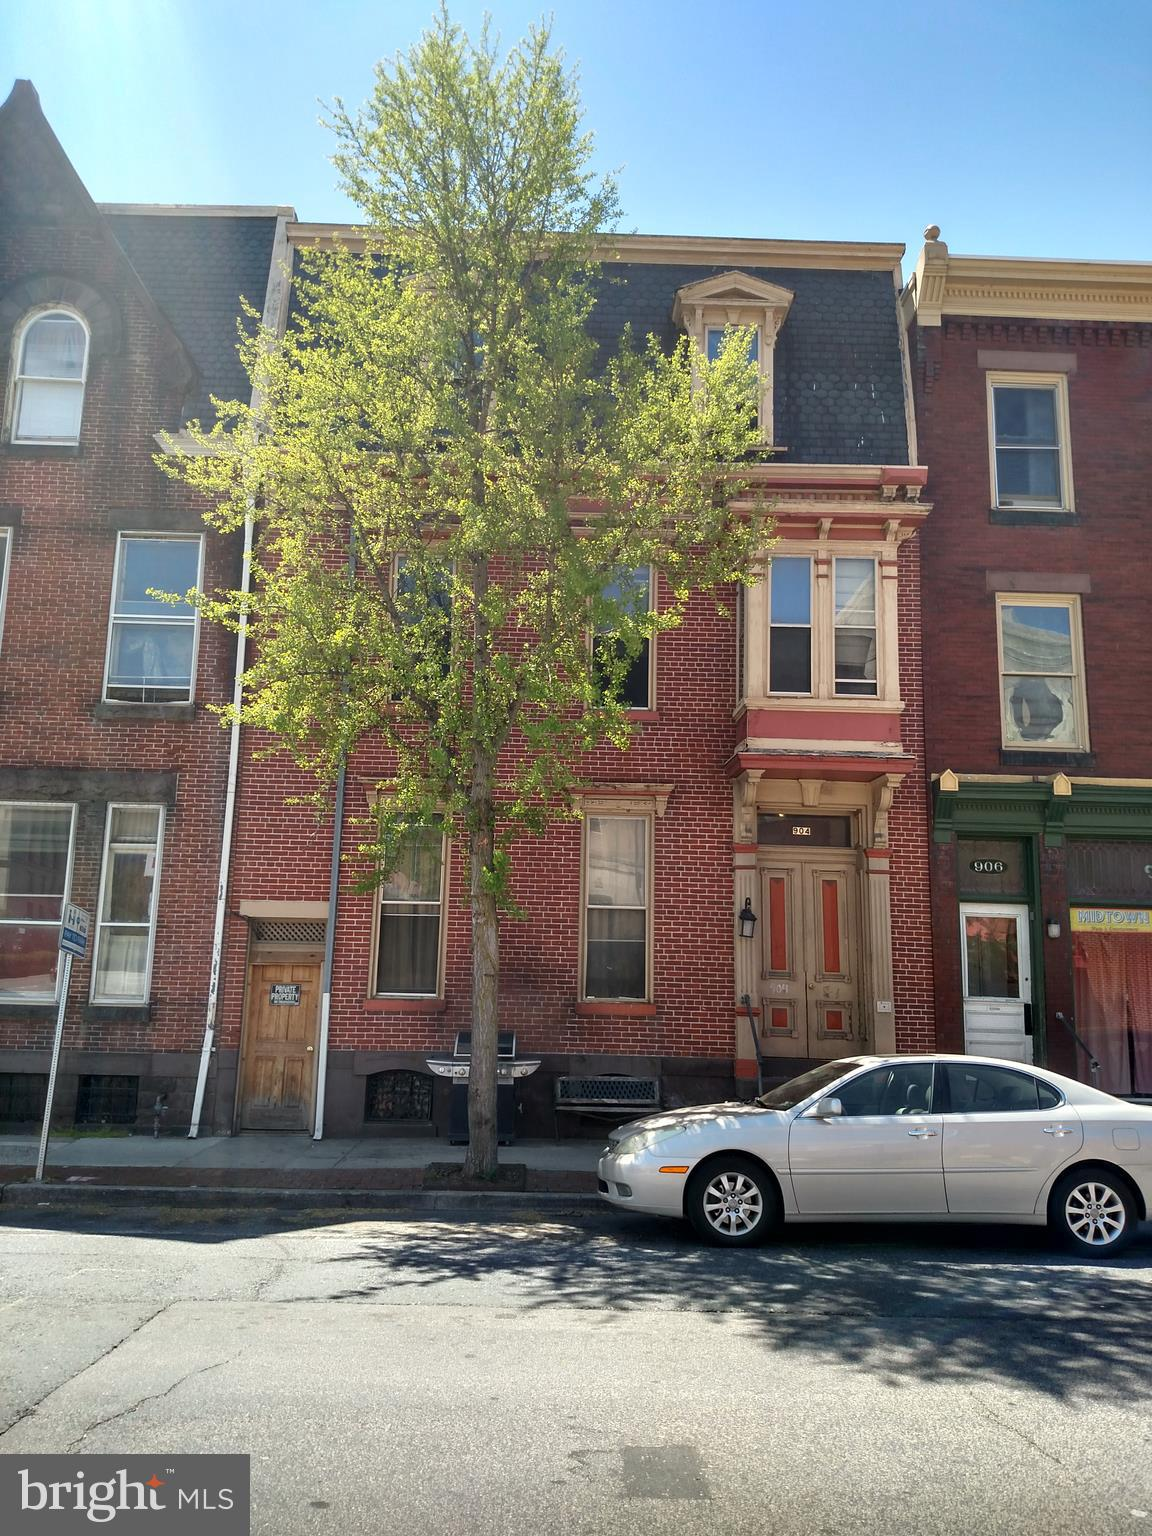 904 N 3RD STREET, HARRISBURG, PA 17102